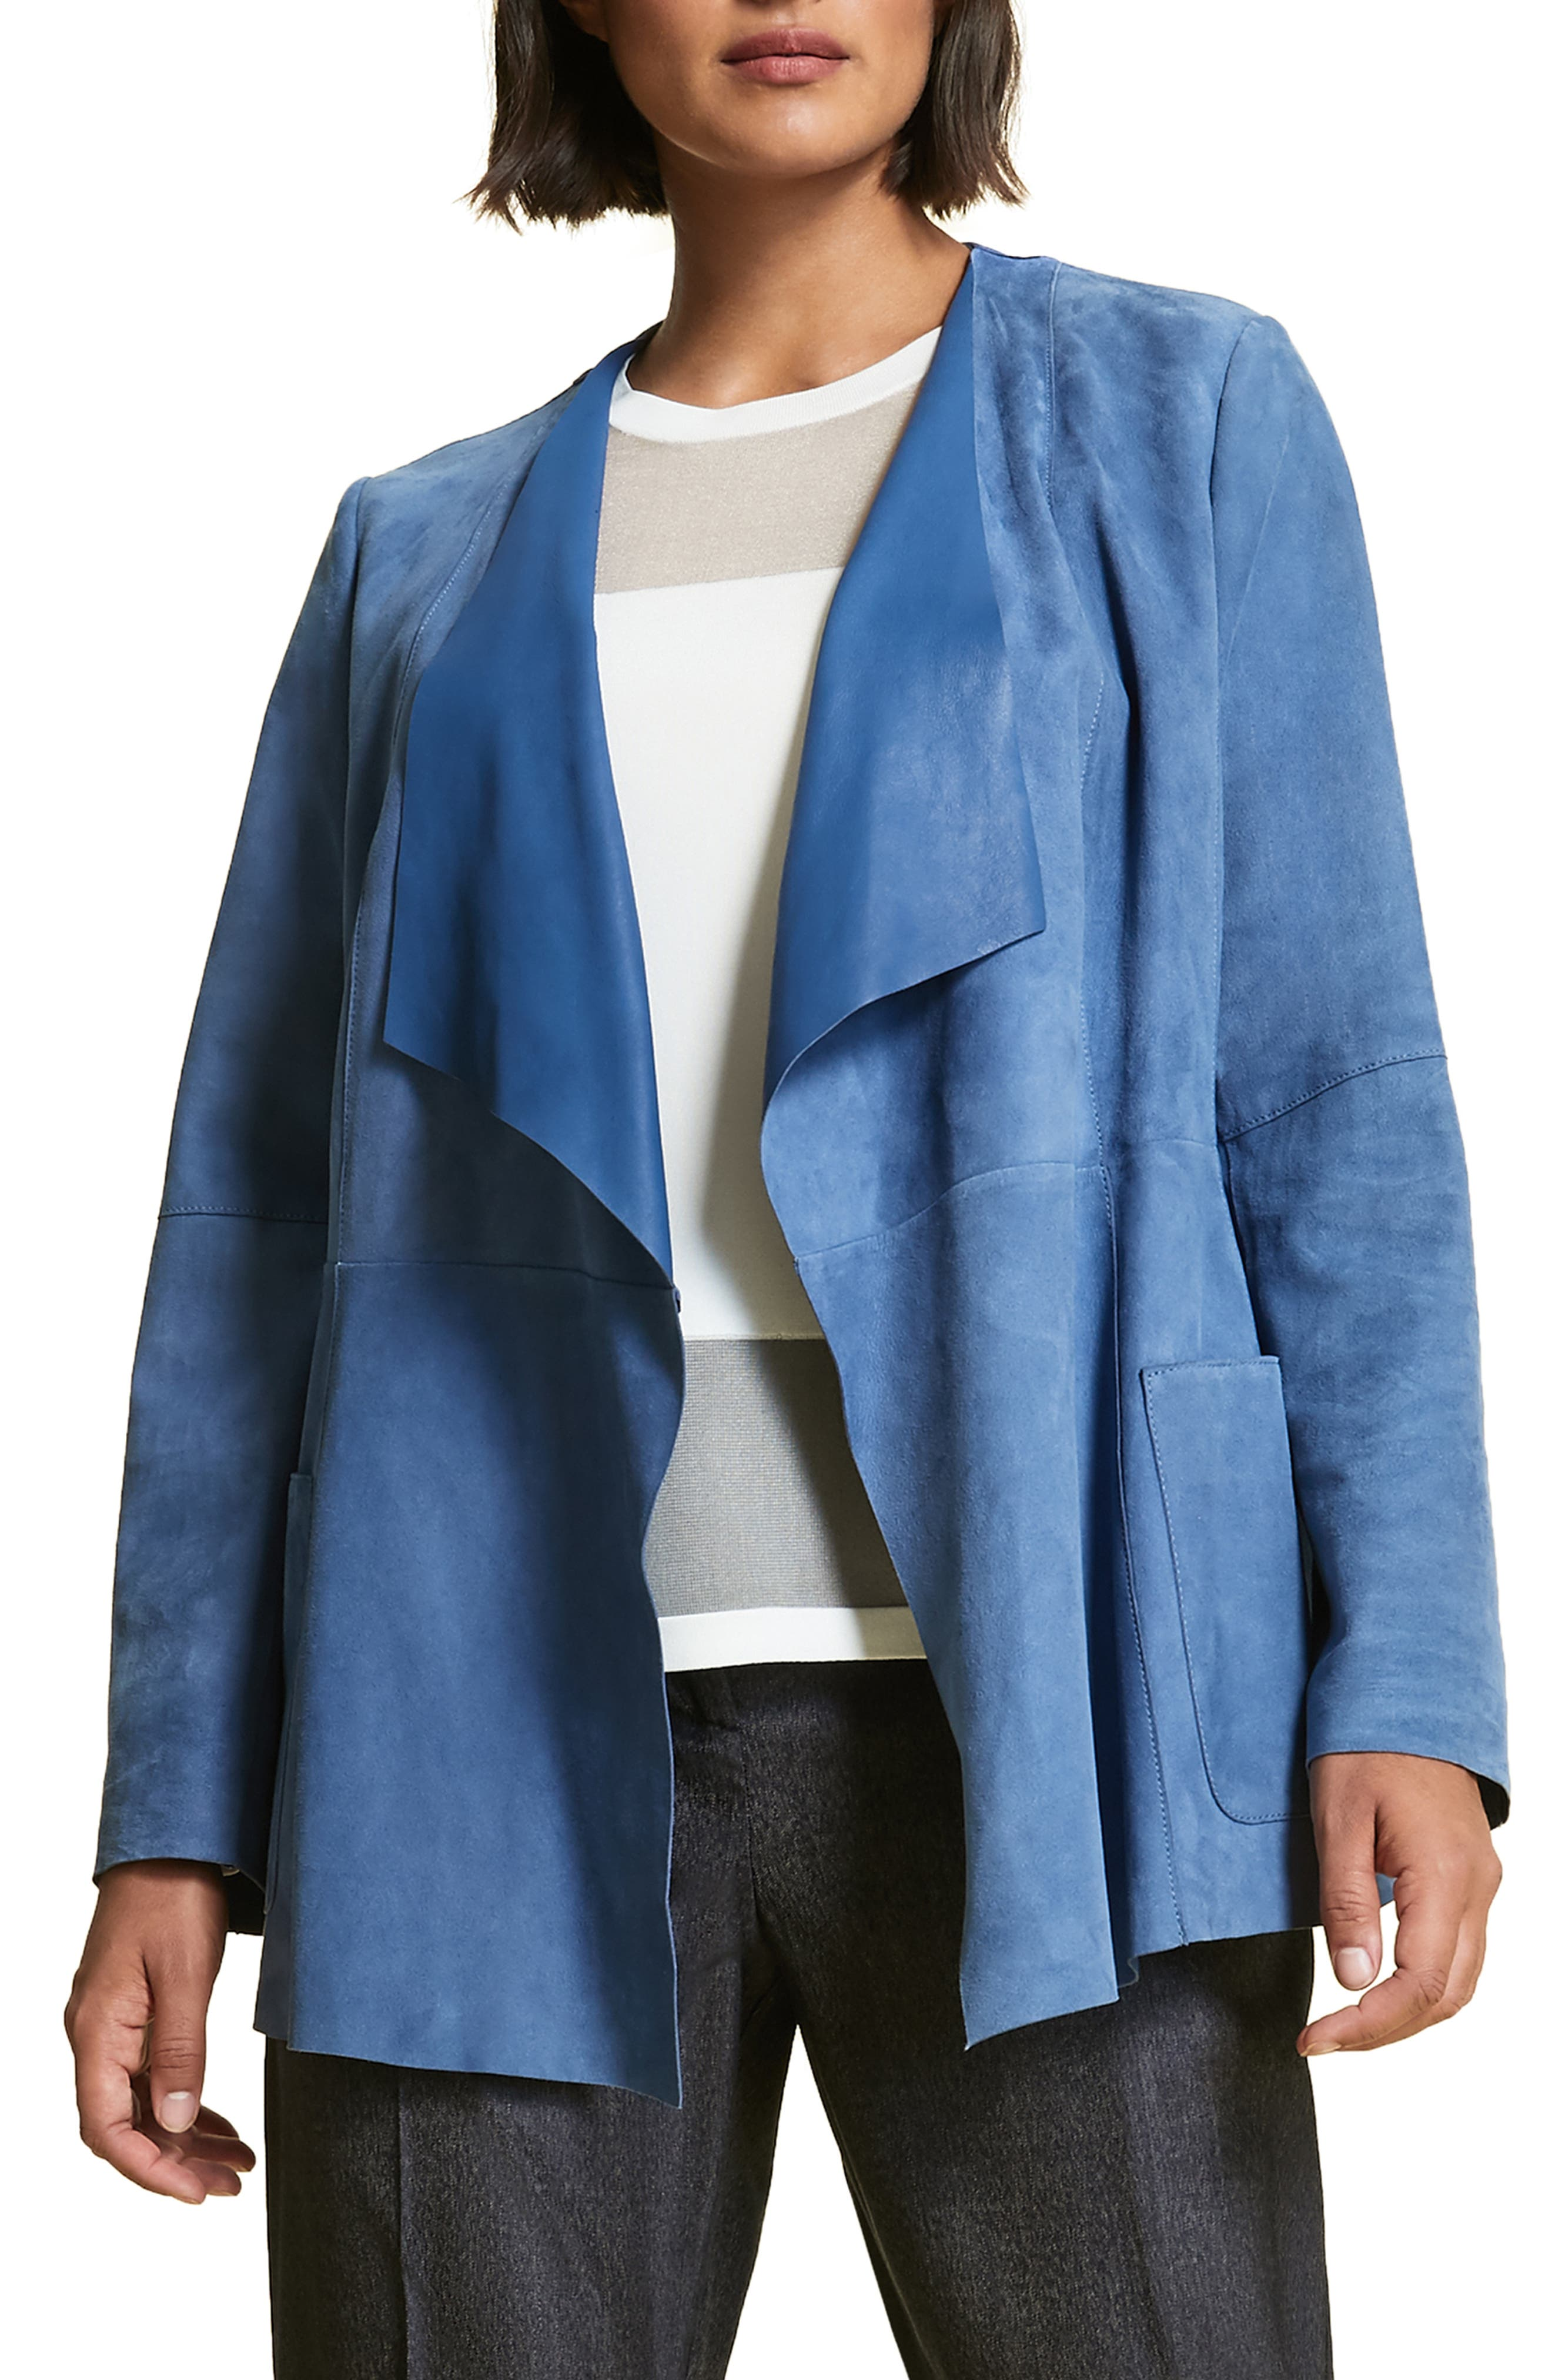 plus size women's marina rinaldi etere suede jacket